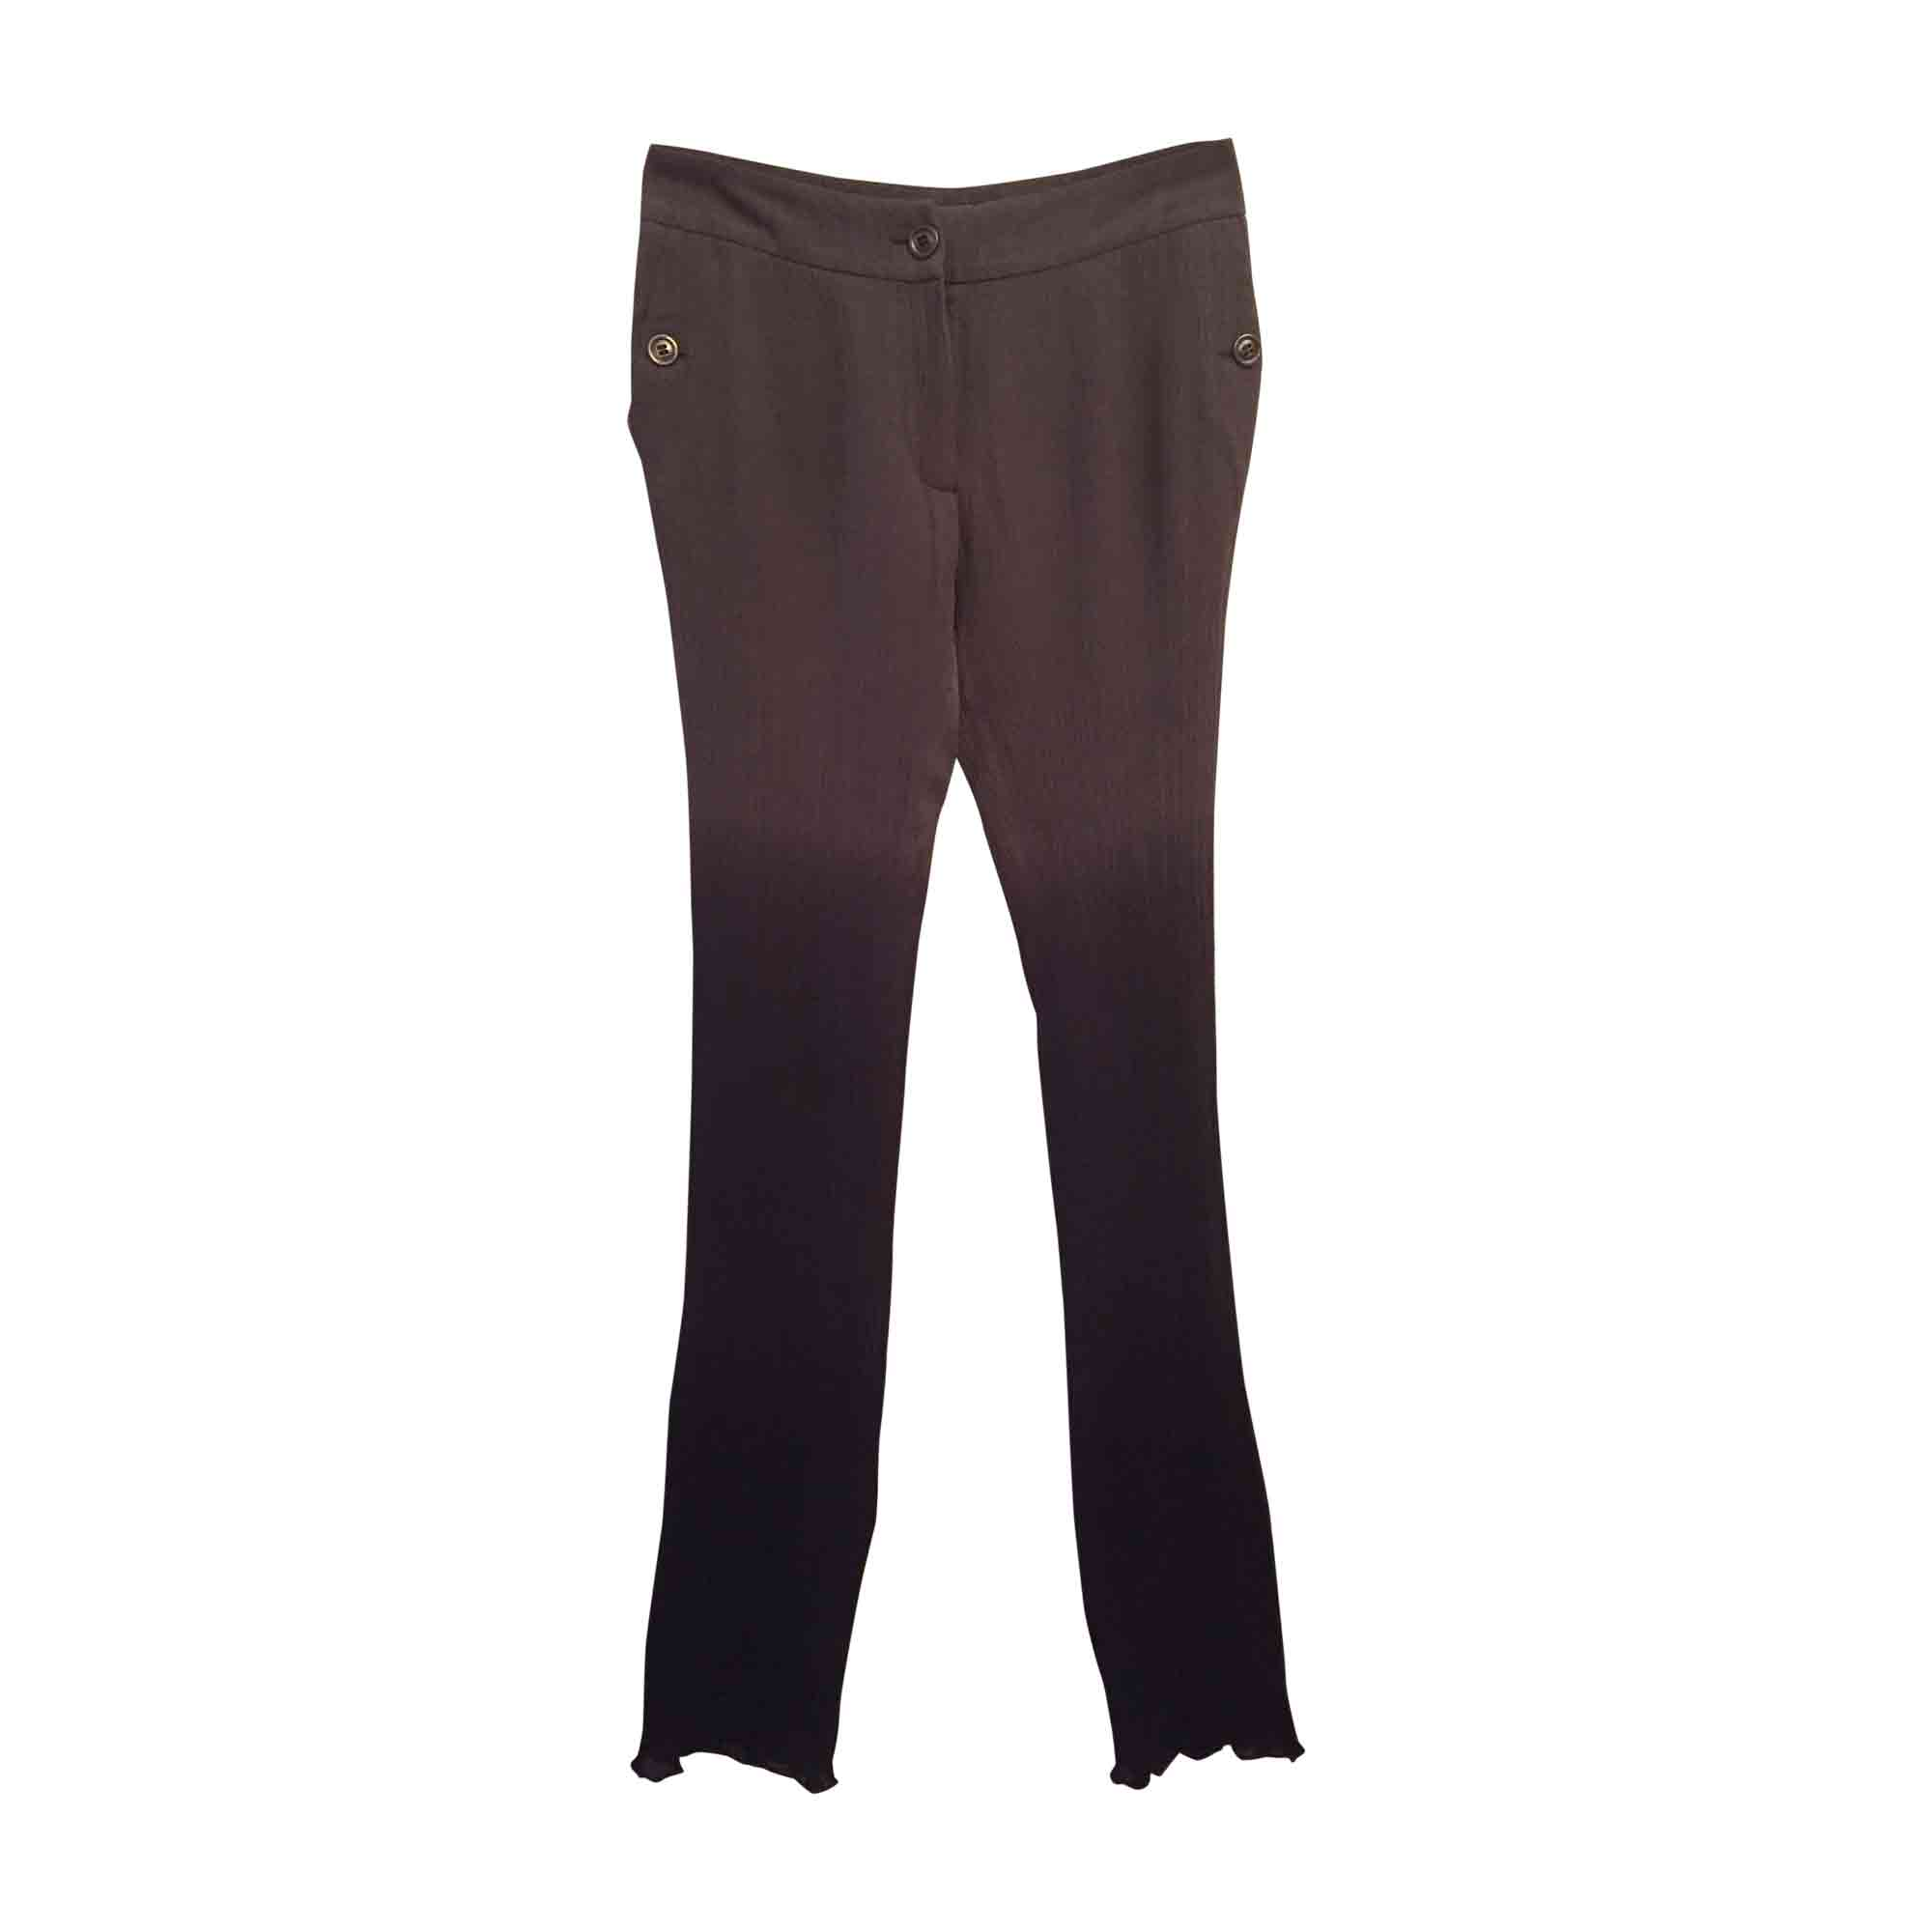 Pantalon slim, cigarette BURBERRY Gris, anthracite